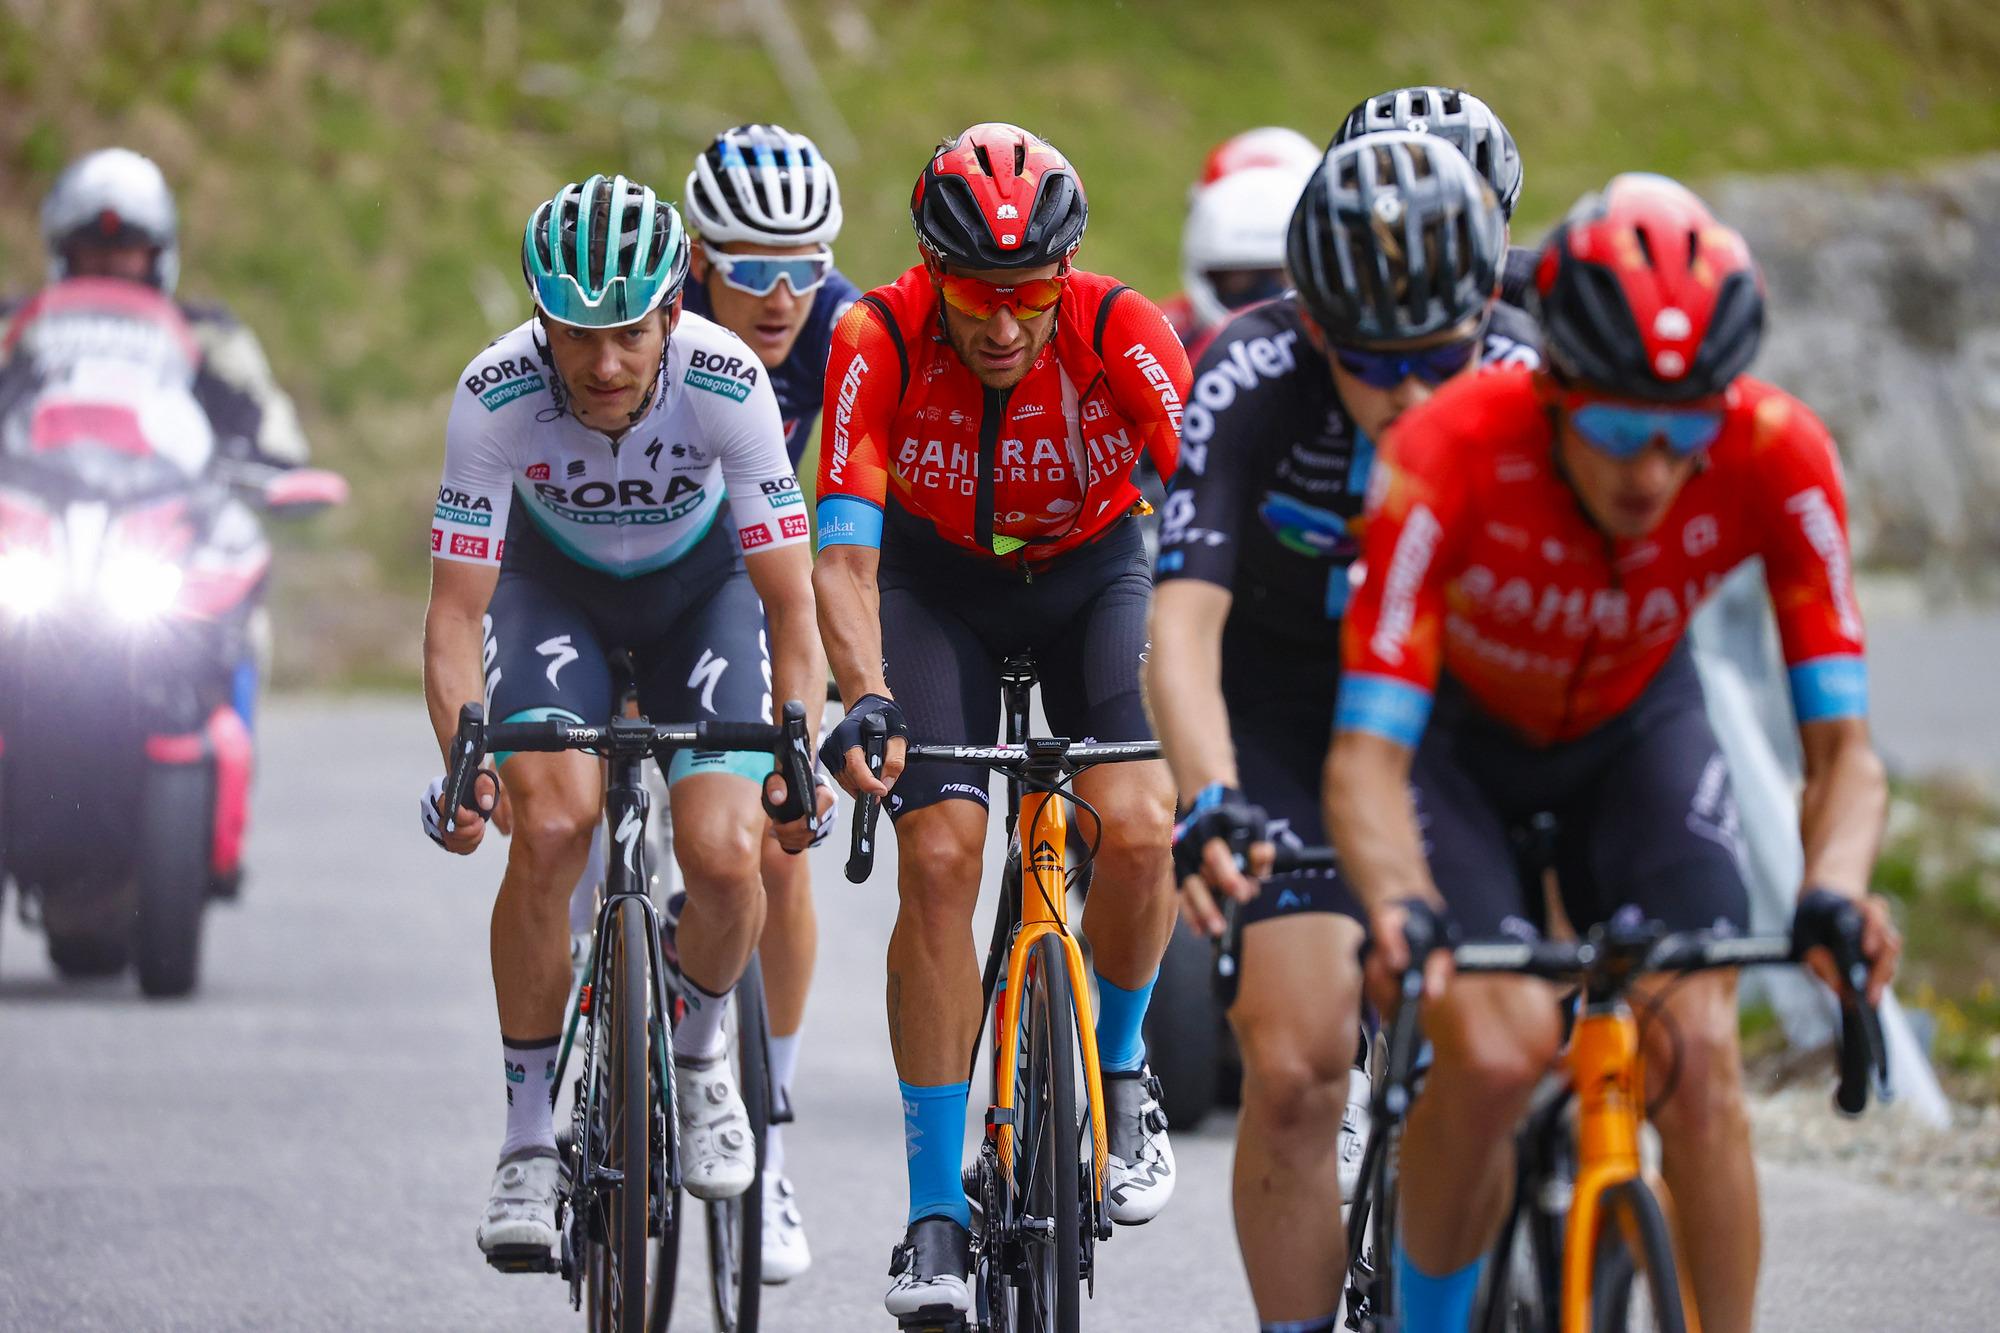 Giro d'Italia 2021 - 104th Edition - 20th stage Verbania - Valle Spluga - Alpe Motta 164 km - 29/05/2021 - Damiano Caruso (ITA - Bahrain Victorious) - Felix Grossschartner (AUT - Bora - Hansgrohe) - photo Luca Bettini/BettiniPhoto©2021